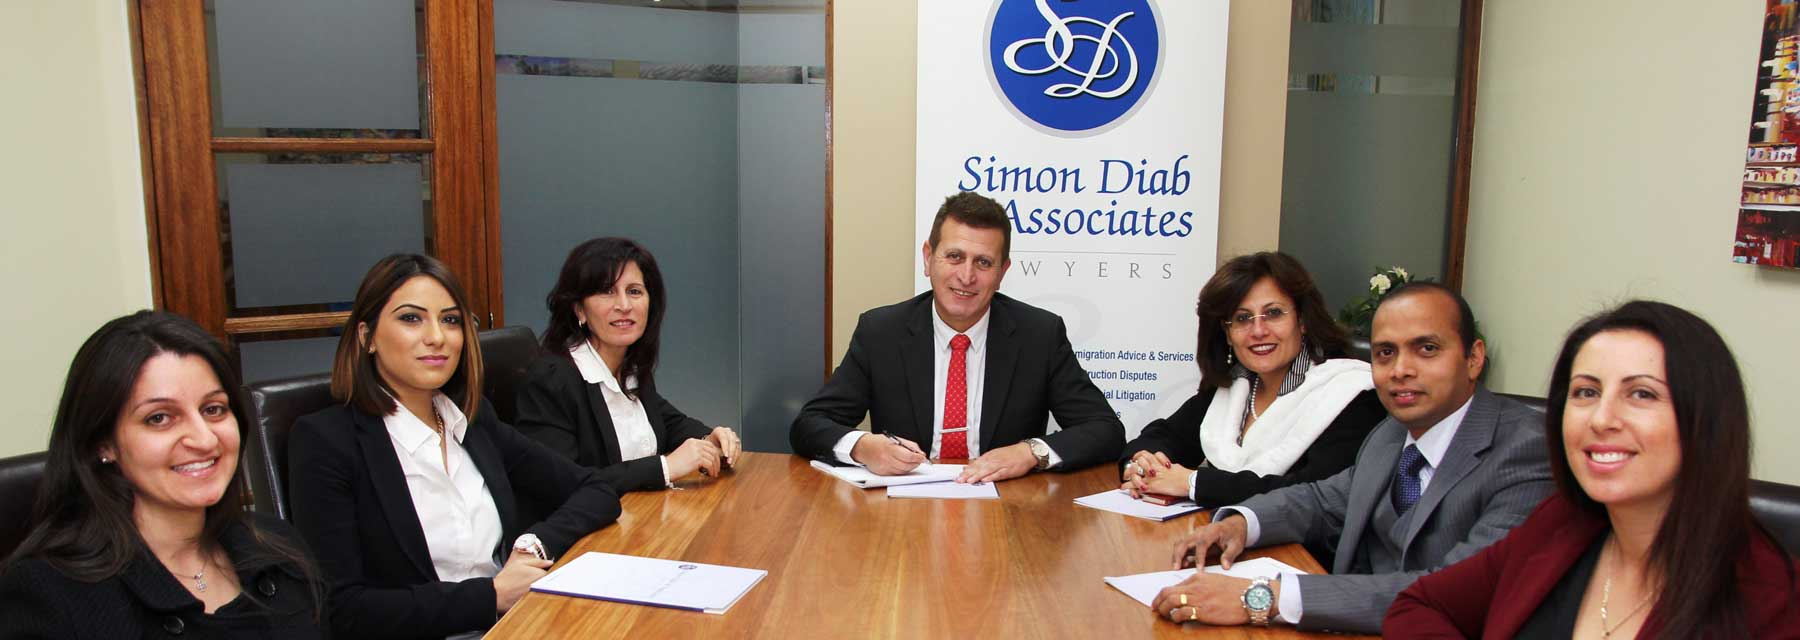 Simon Diab & Associates Staff